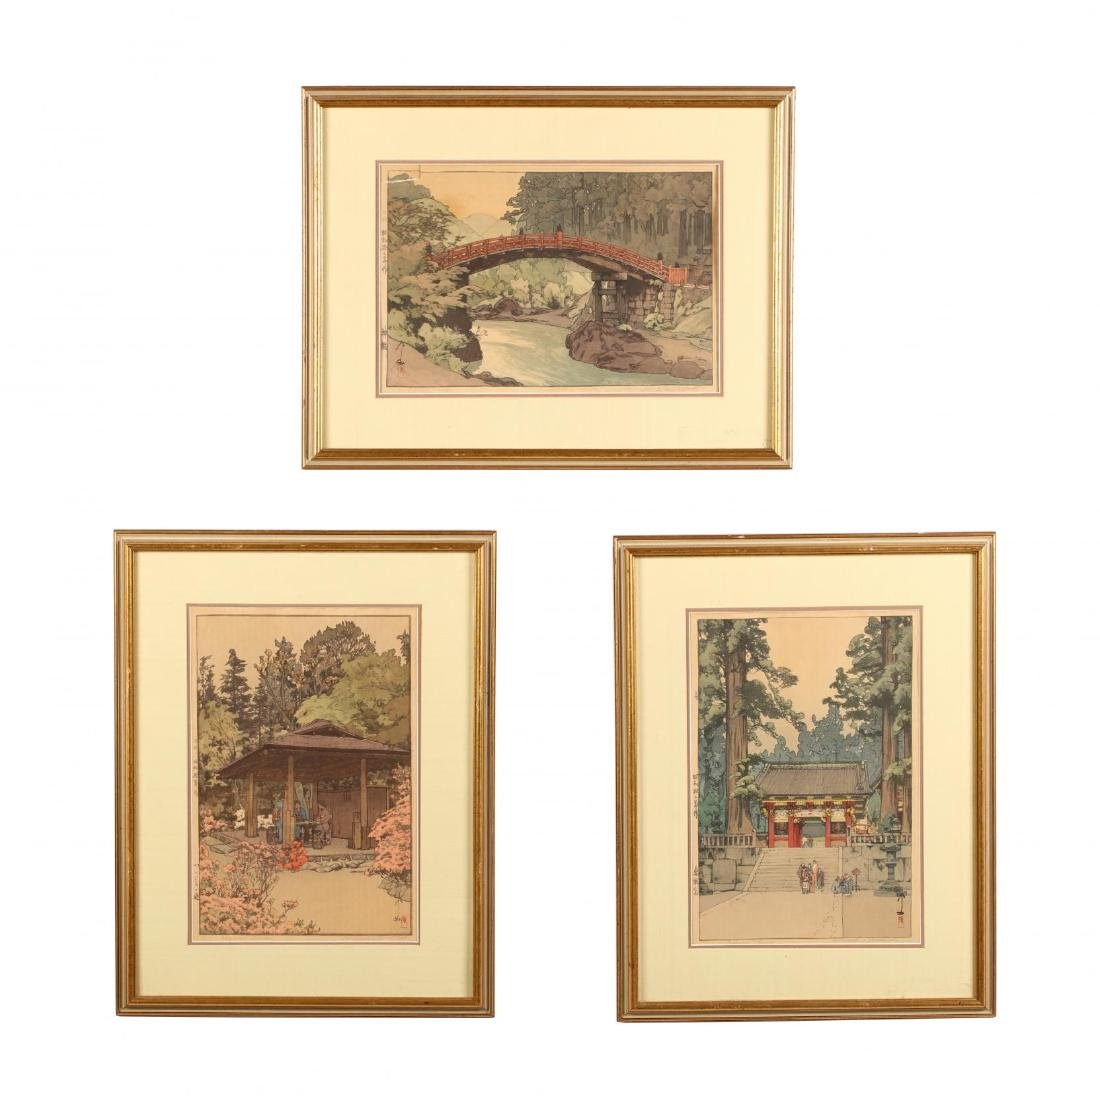 Three Japanese Woodblock Prints by Hiroshi Yoshida